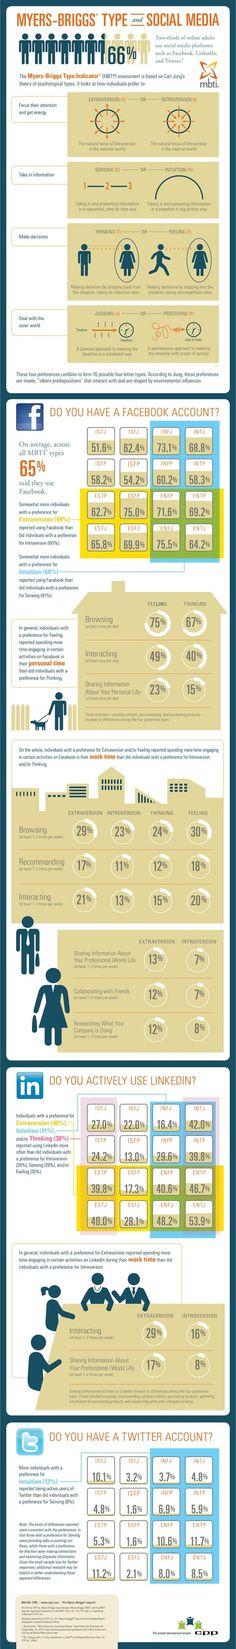 Myers-briggs-infographic